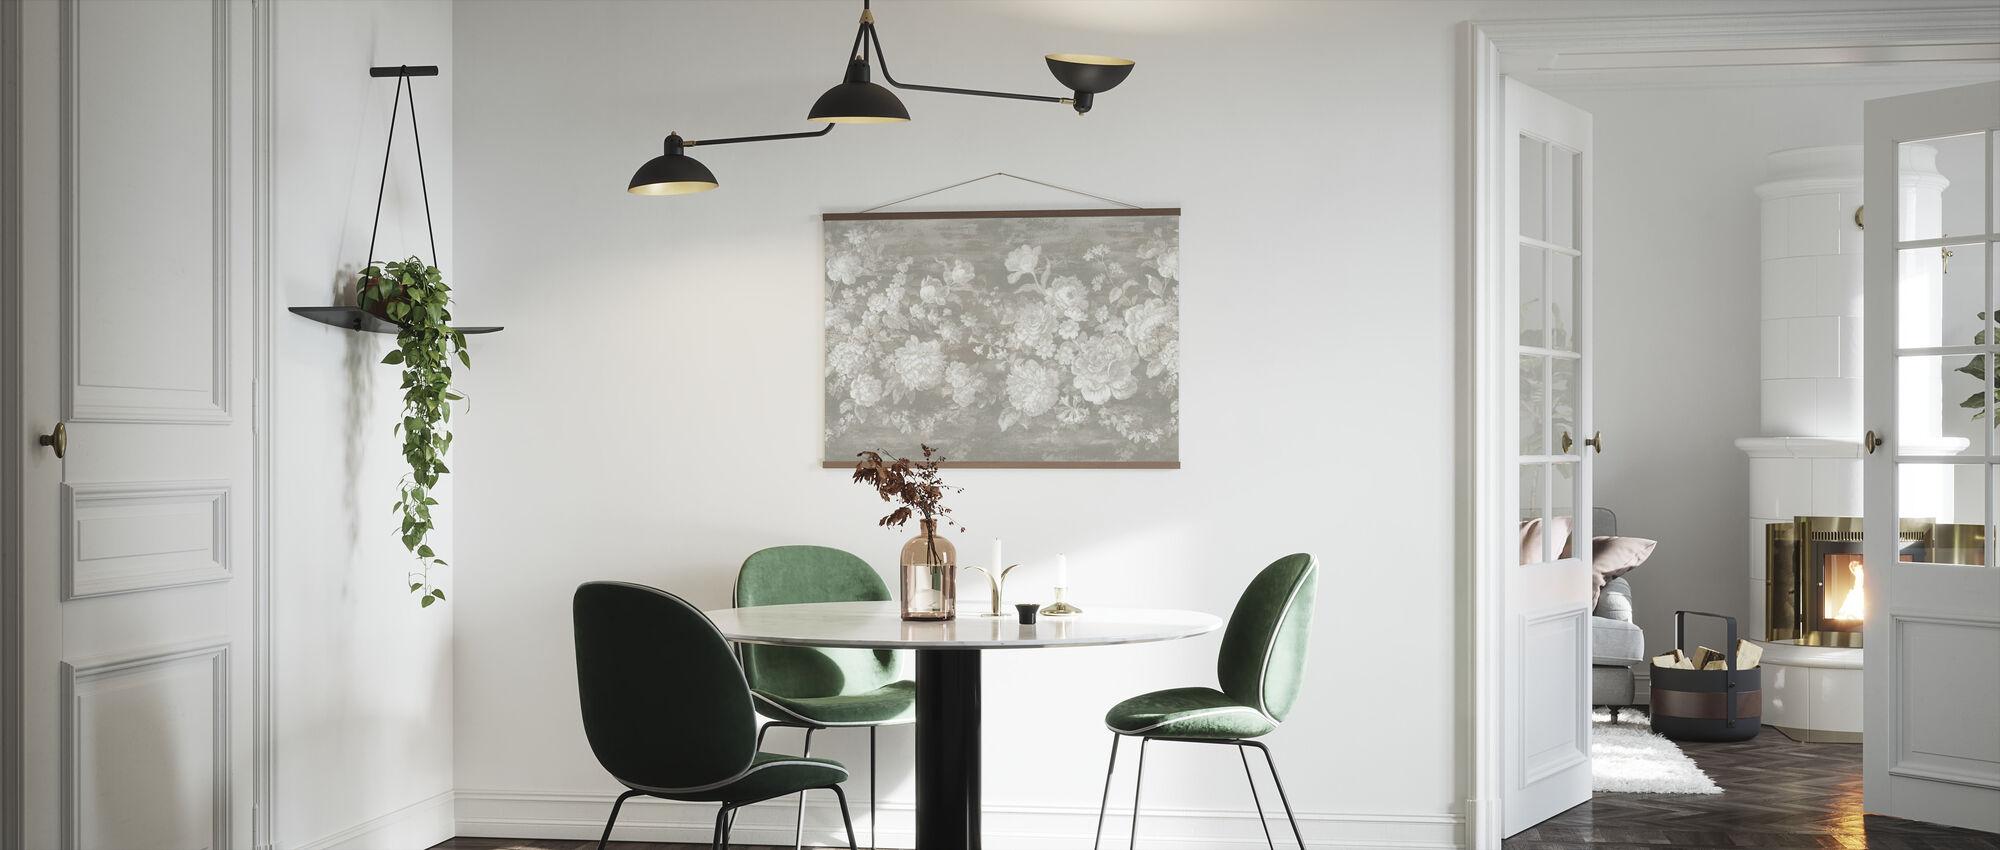 Florian - Poster - Kitchen